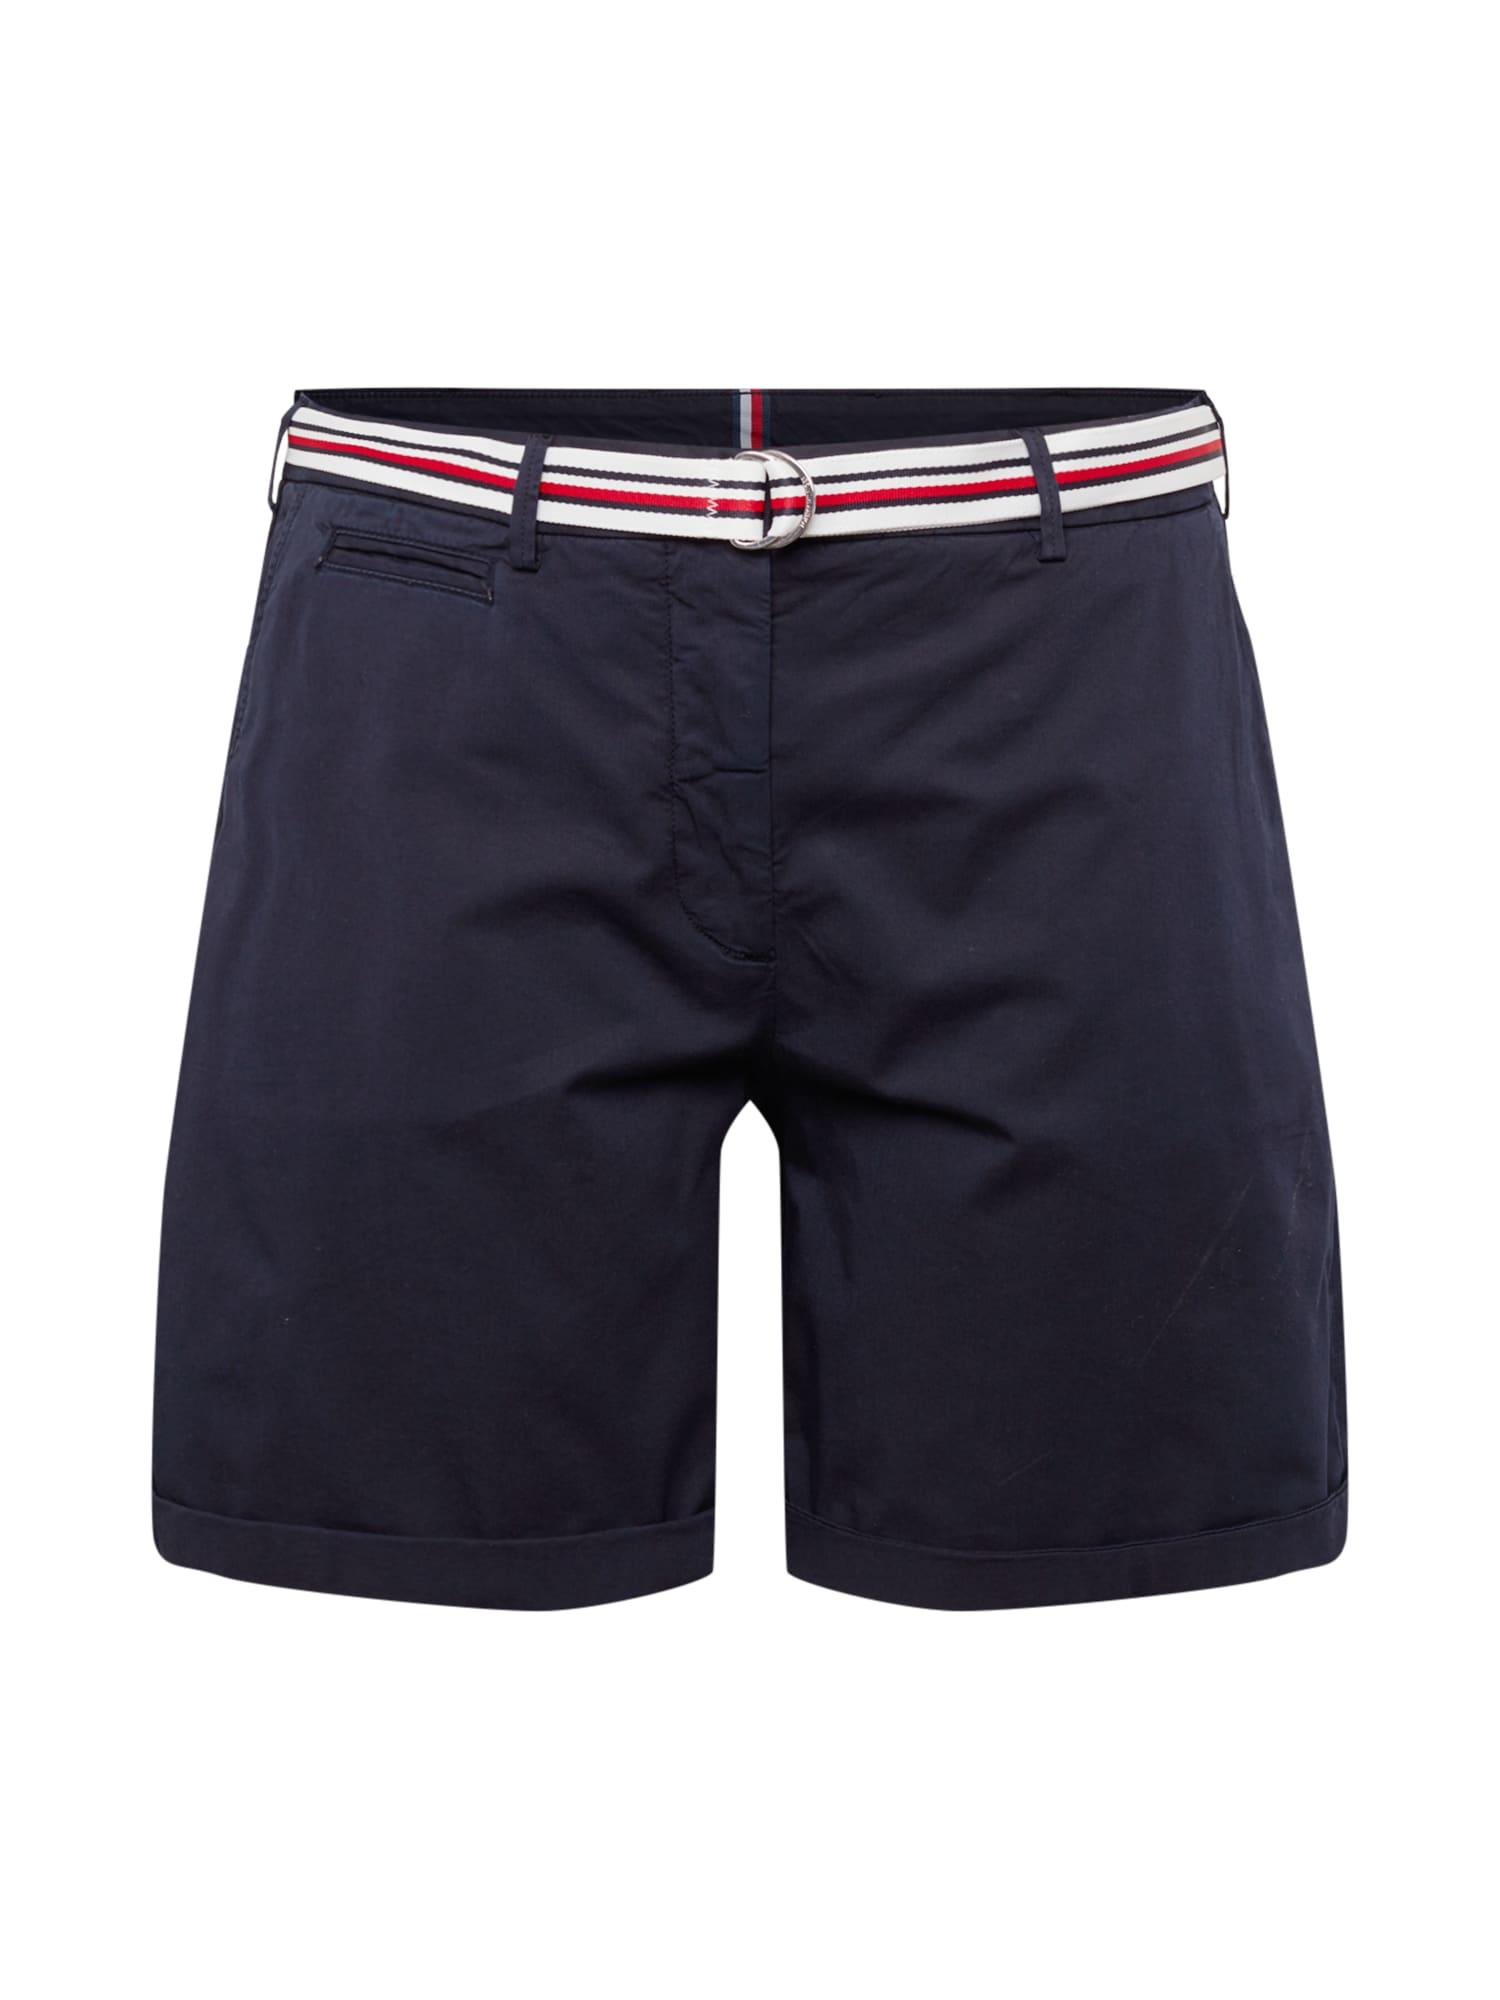 "Tommy Hilfiger Curve ""Chino"" stiliaus kelnės tamsiai mėlyna / balta / raudona"